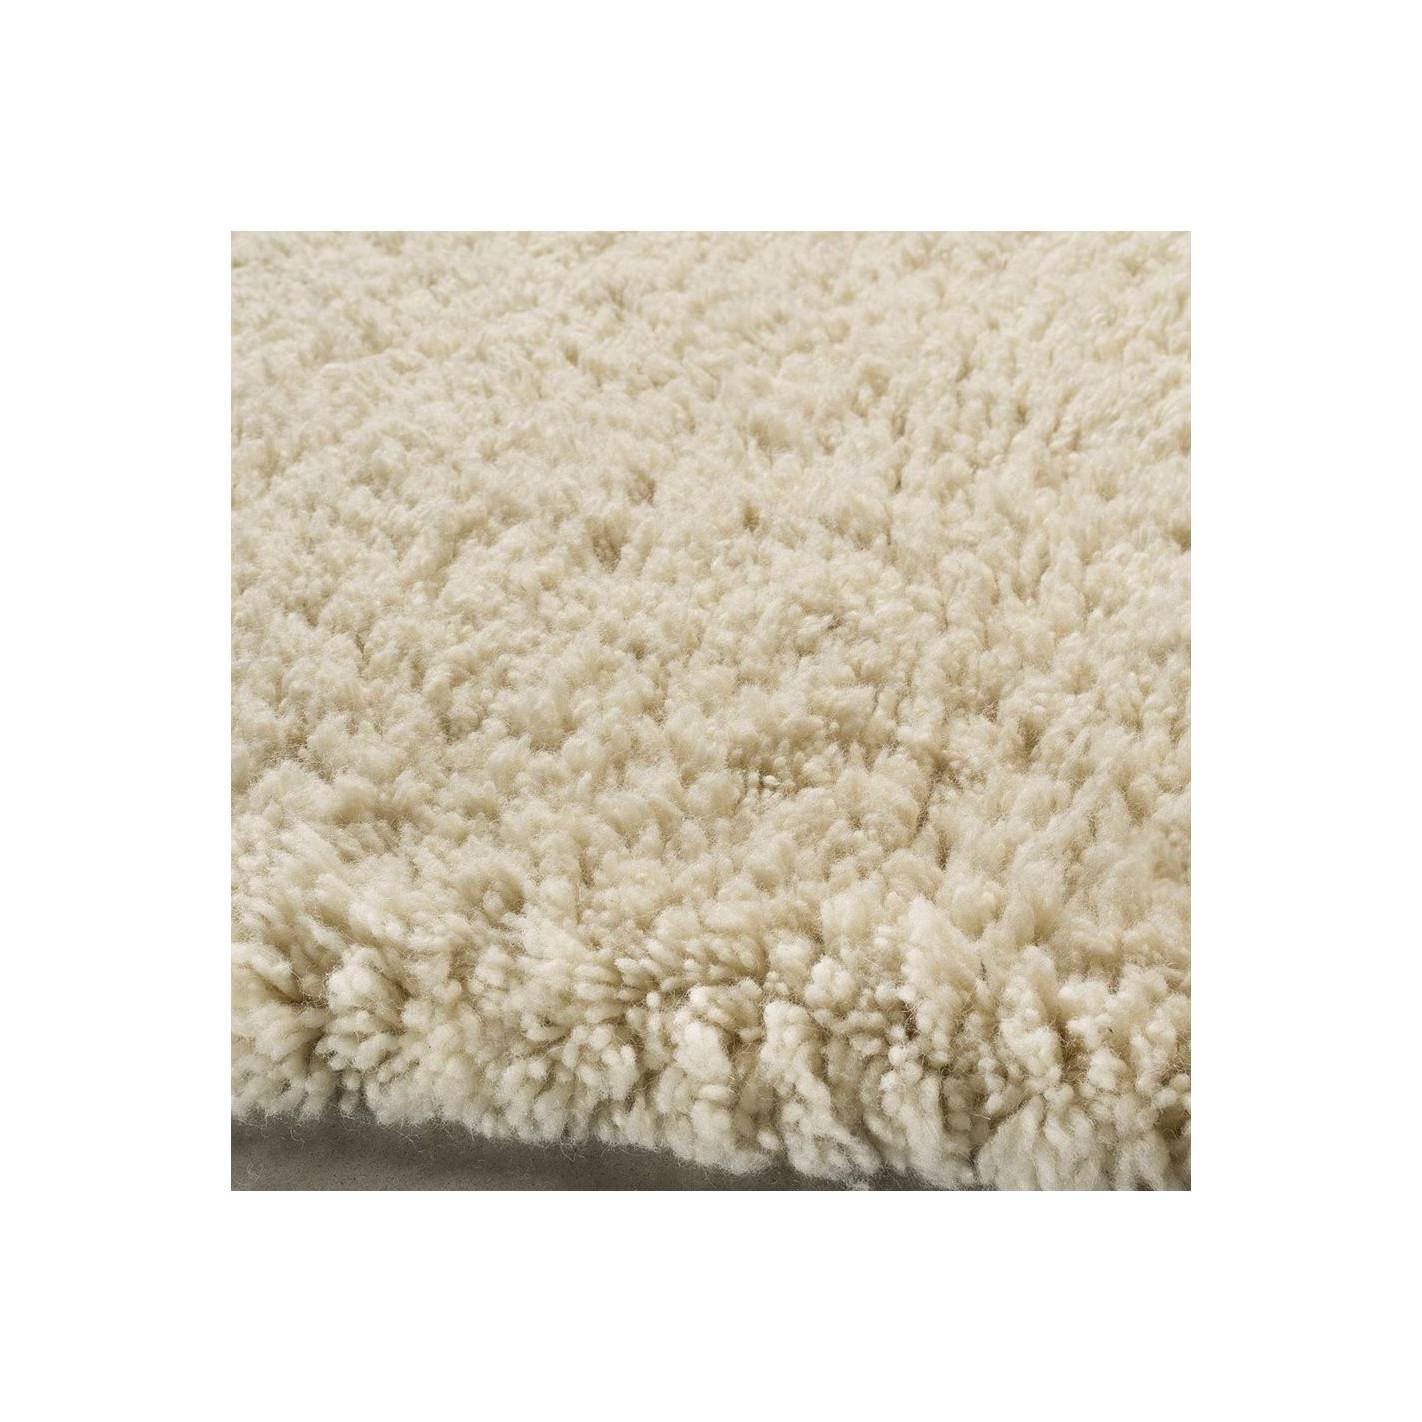 White Berber Carpet Solid Color